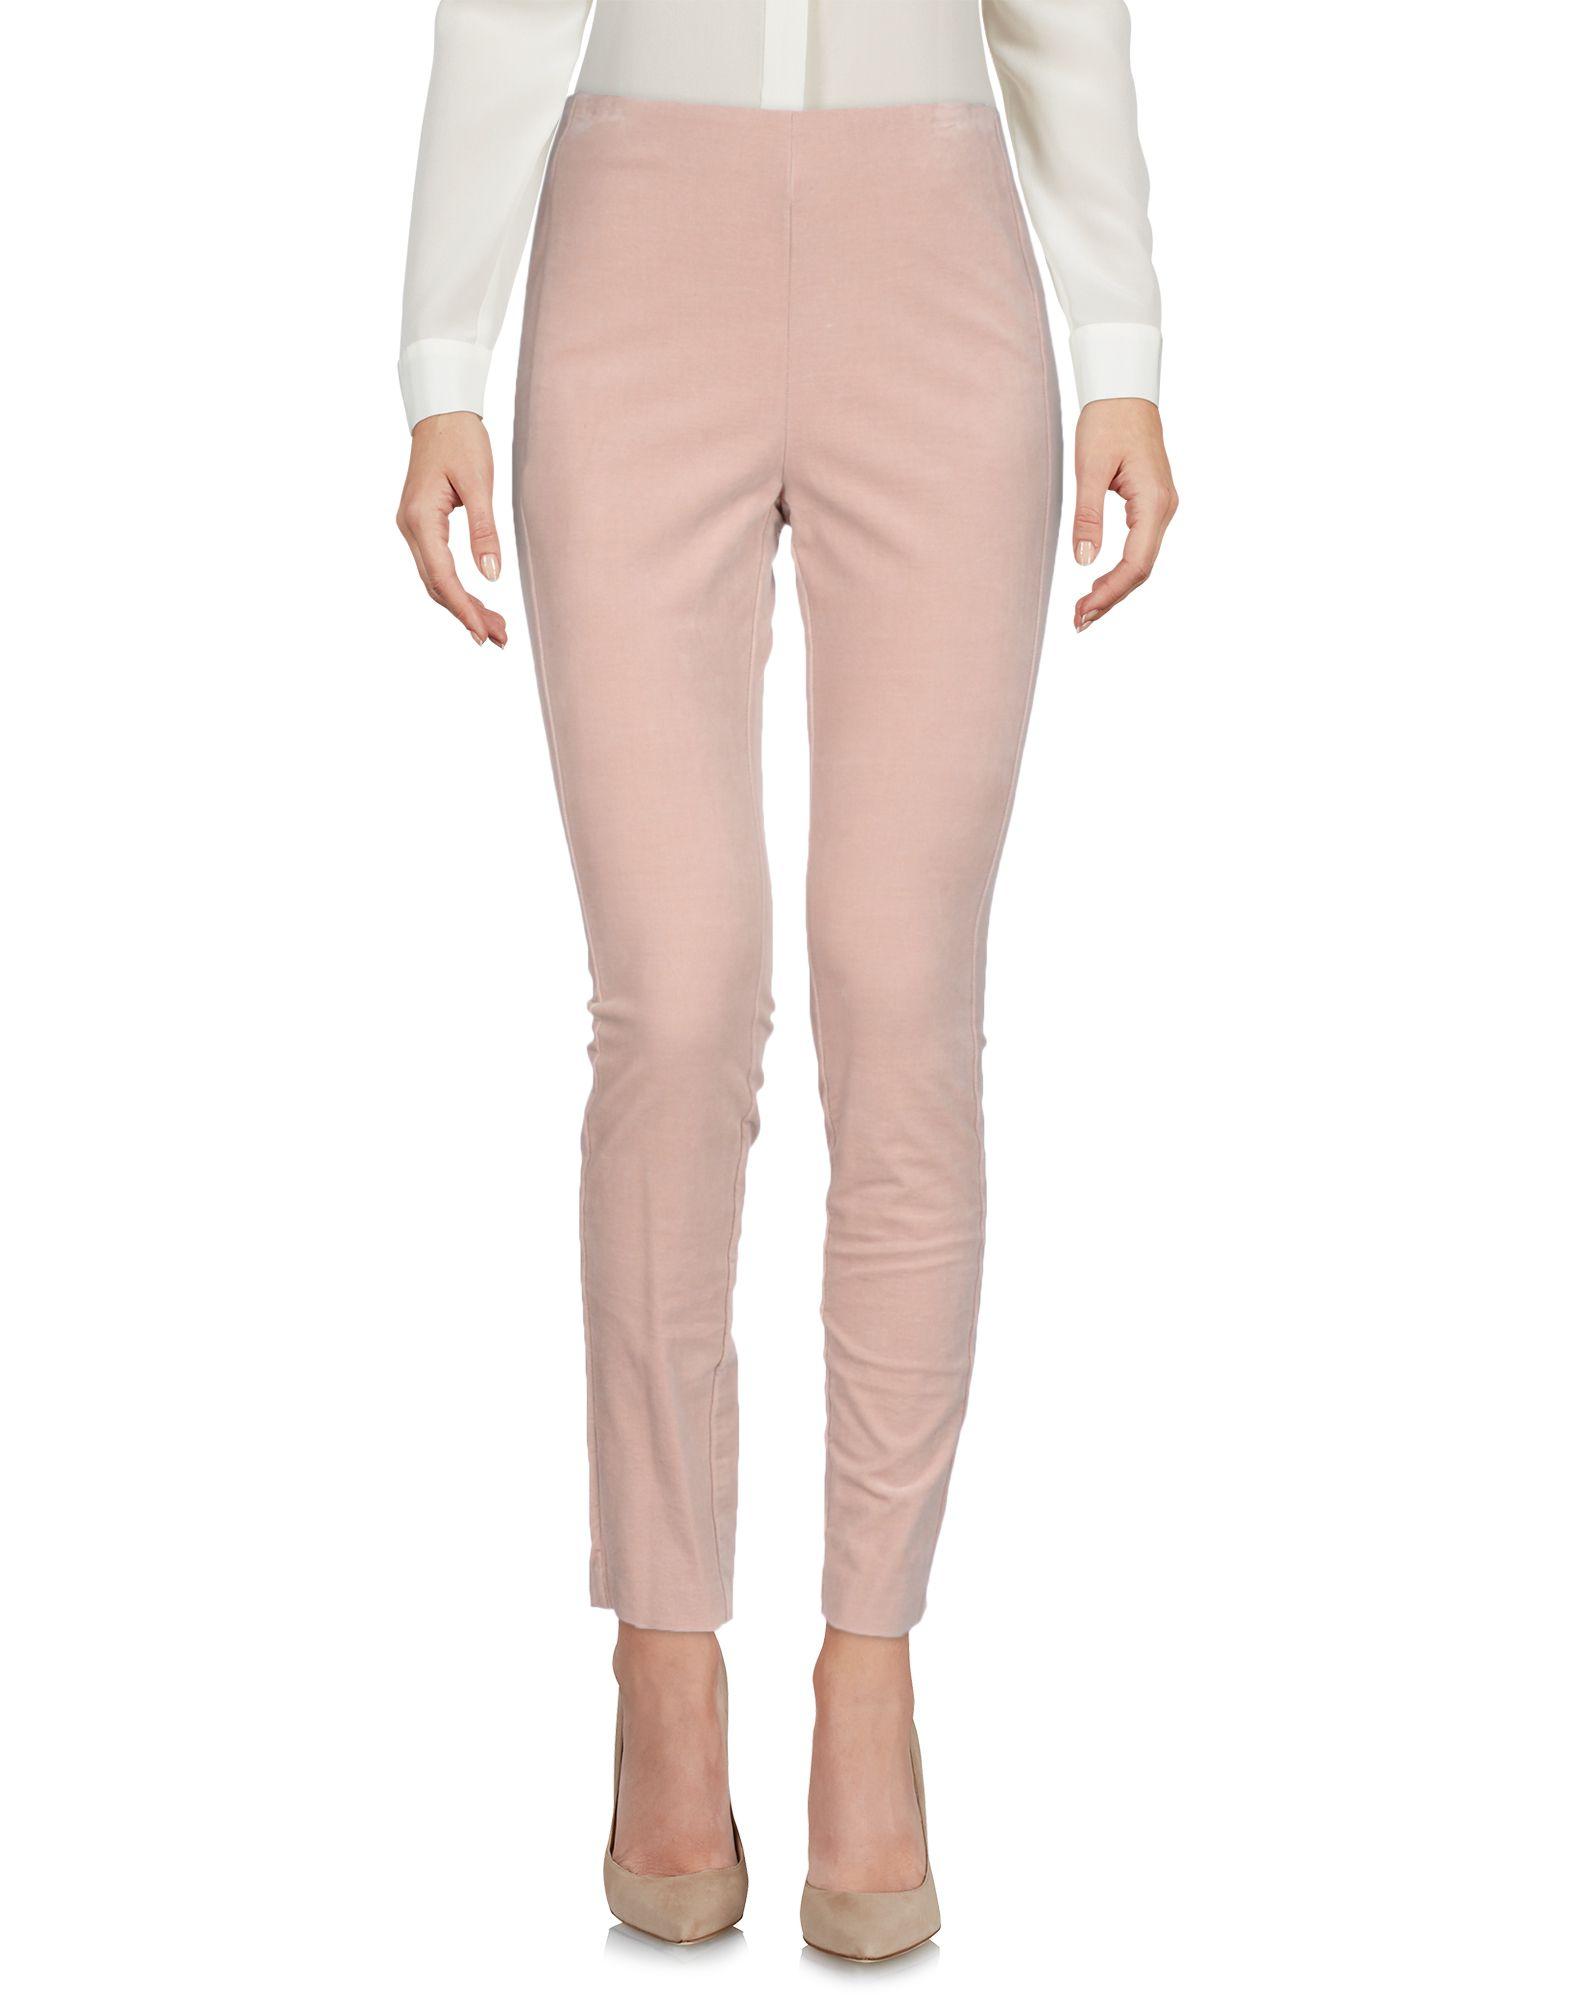 Pantalone Theory Donna - Acquista online su 7uxgvn5